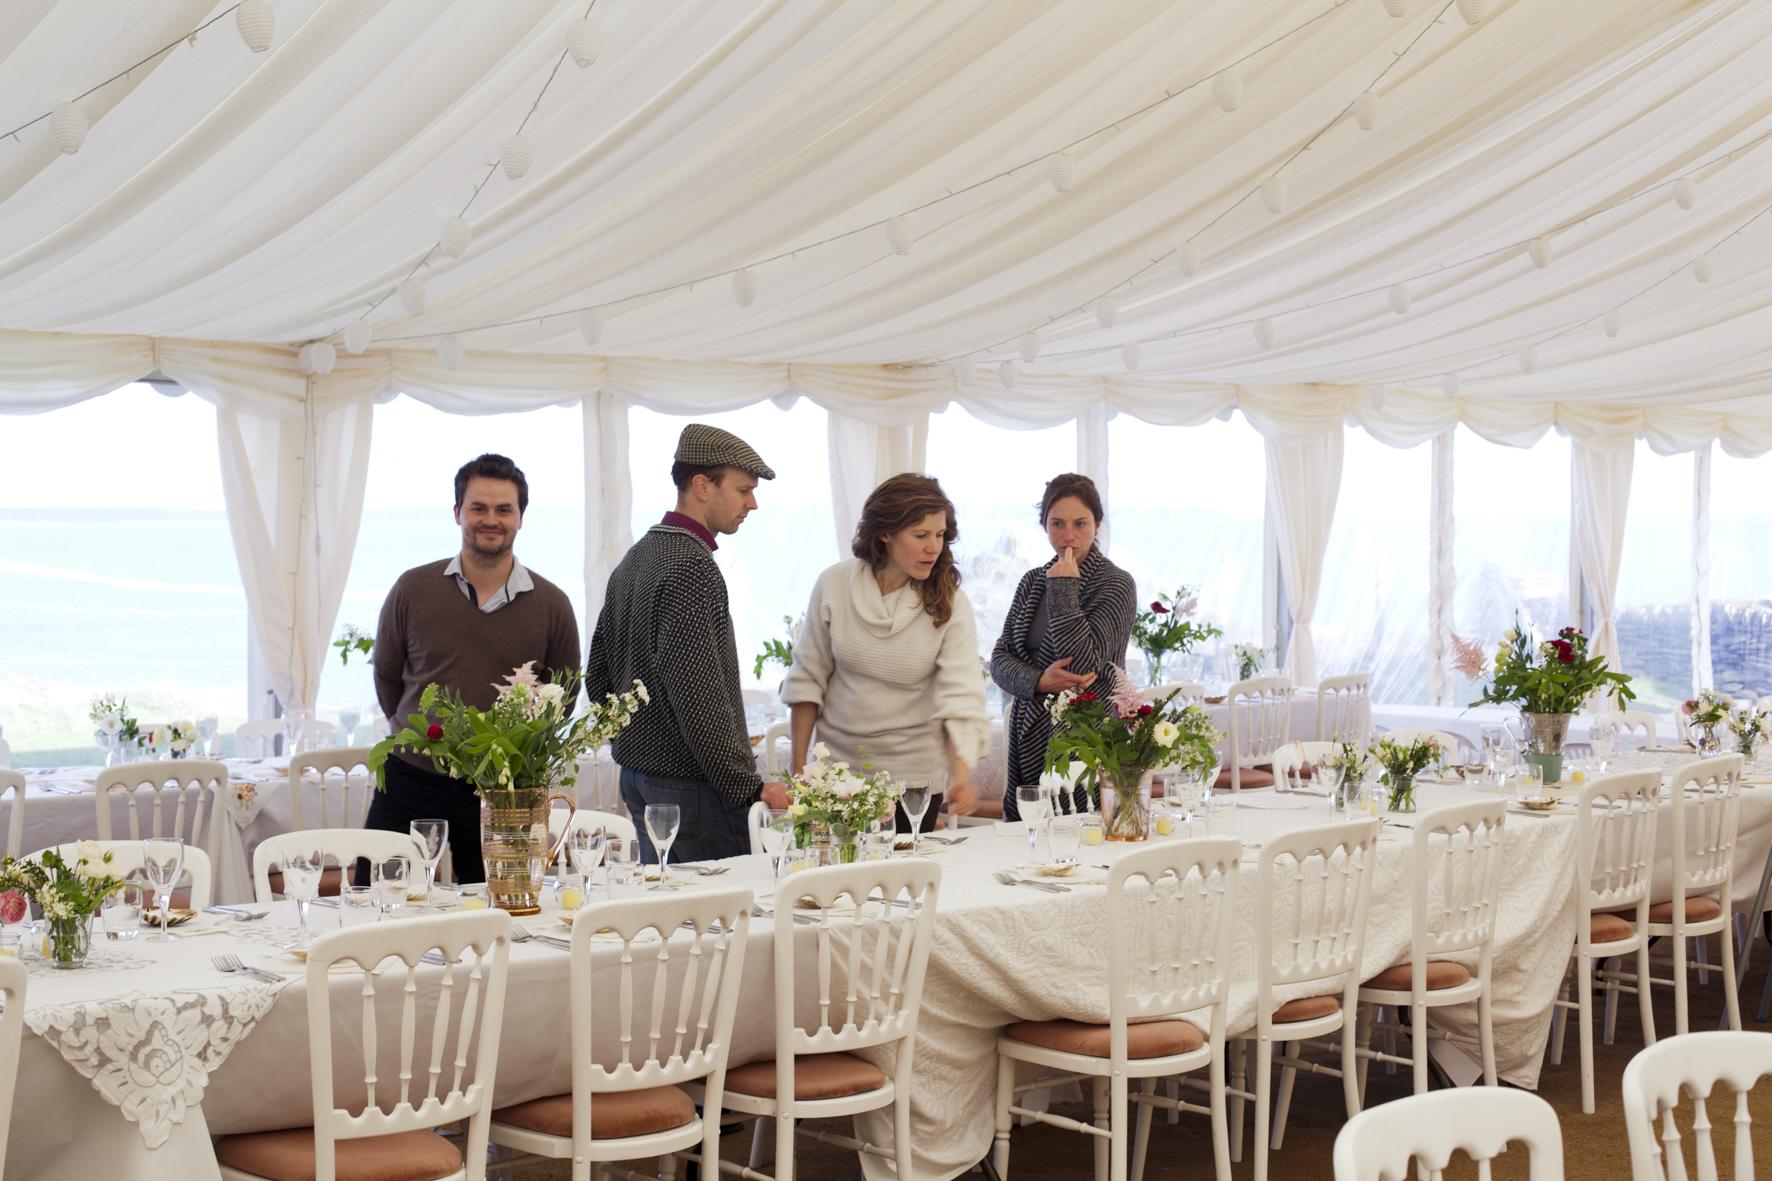 Wedding example_M&P__MG_2309_Claudia Leisinger.jpg